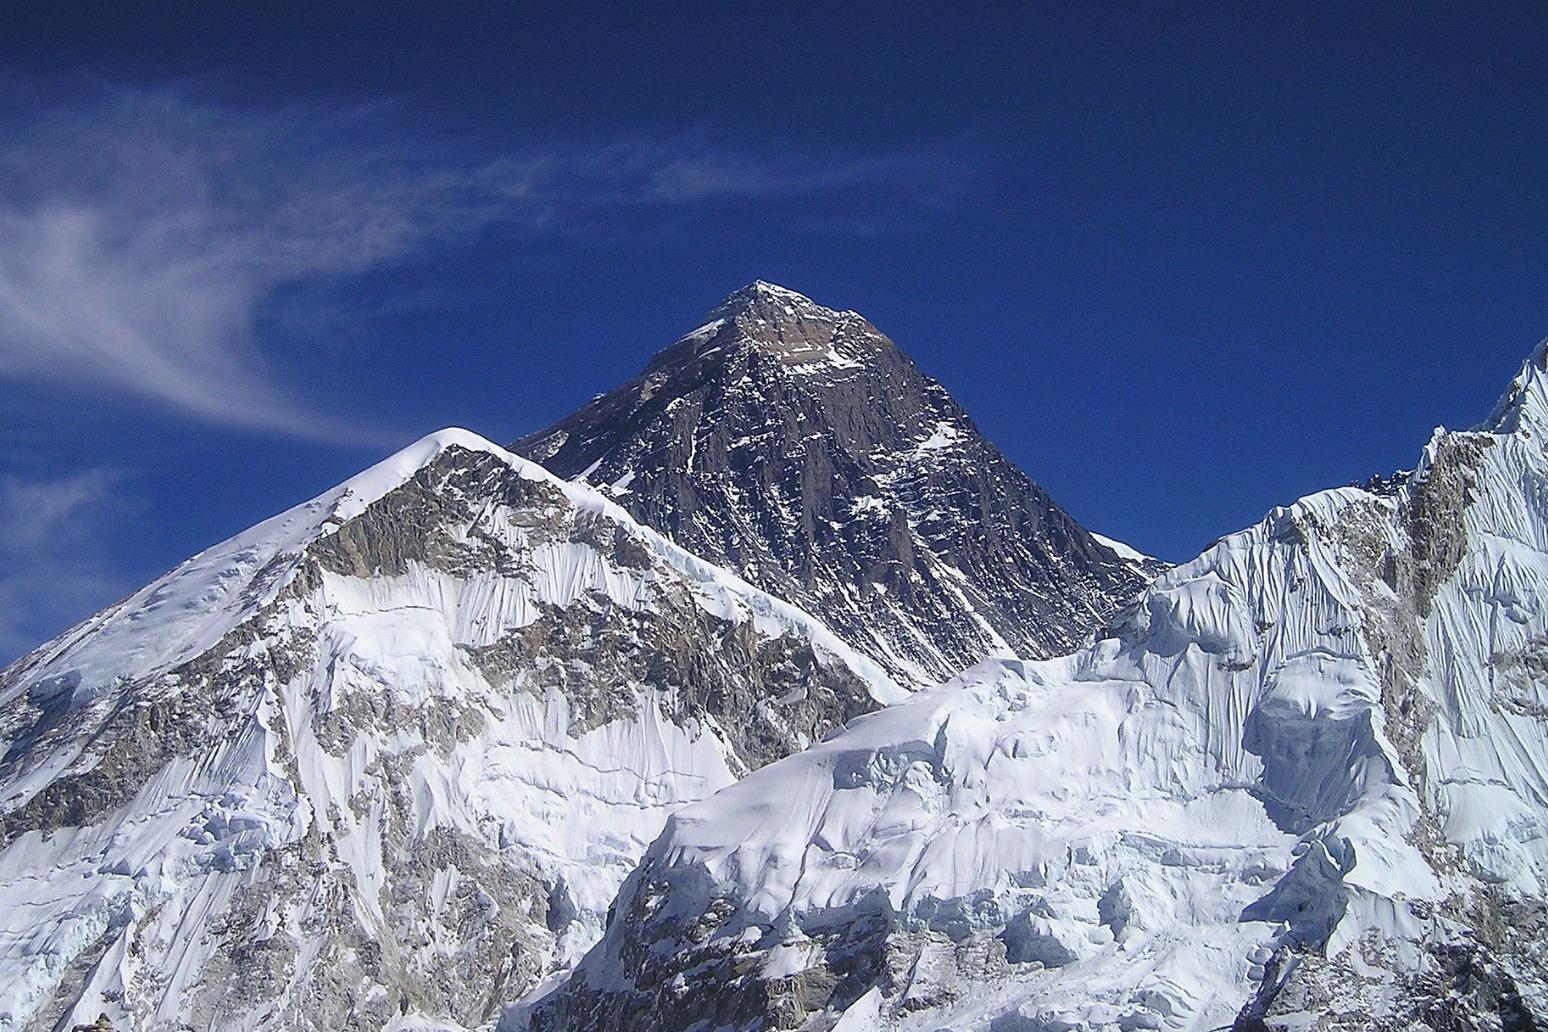 UK man dies on Mount Everest